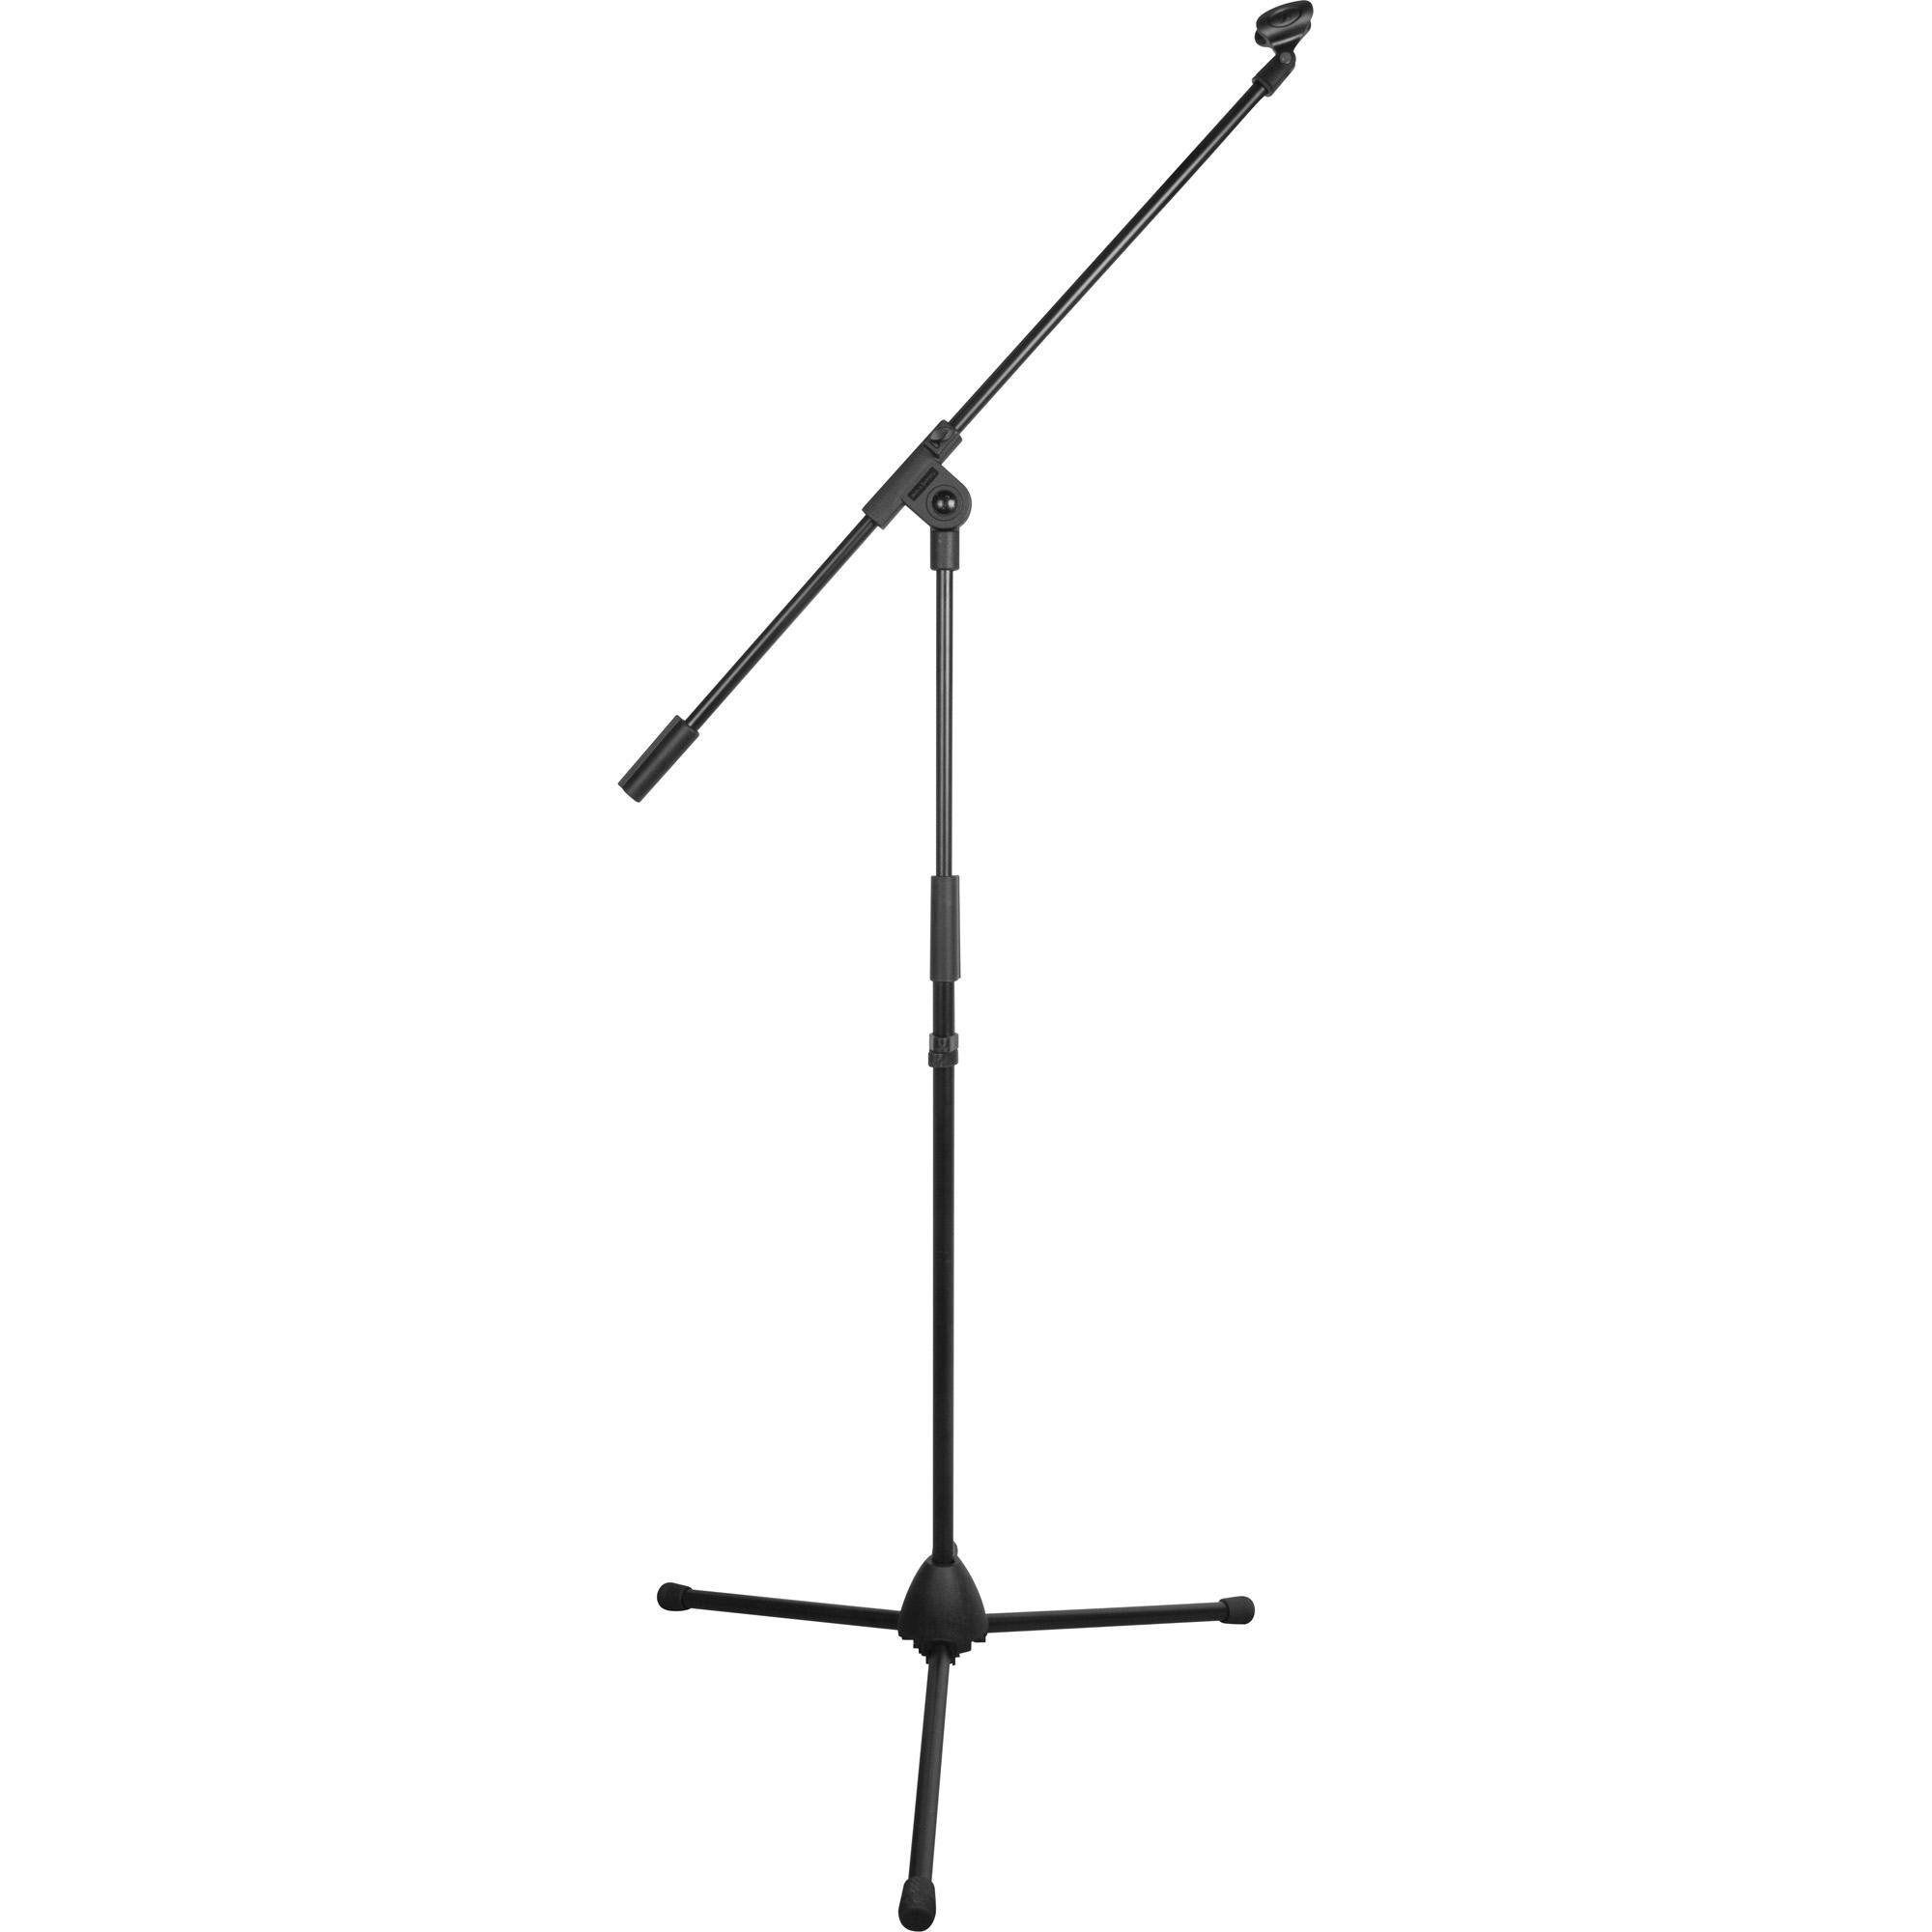 Kit Microfone + Suporte E-PACK E835 Sennheiser